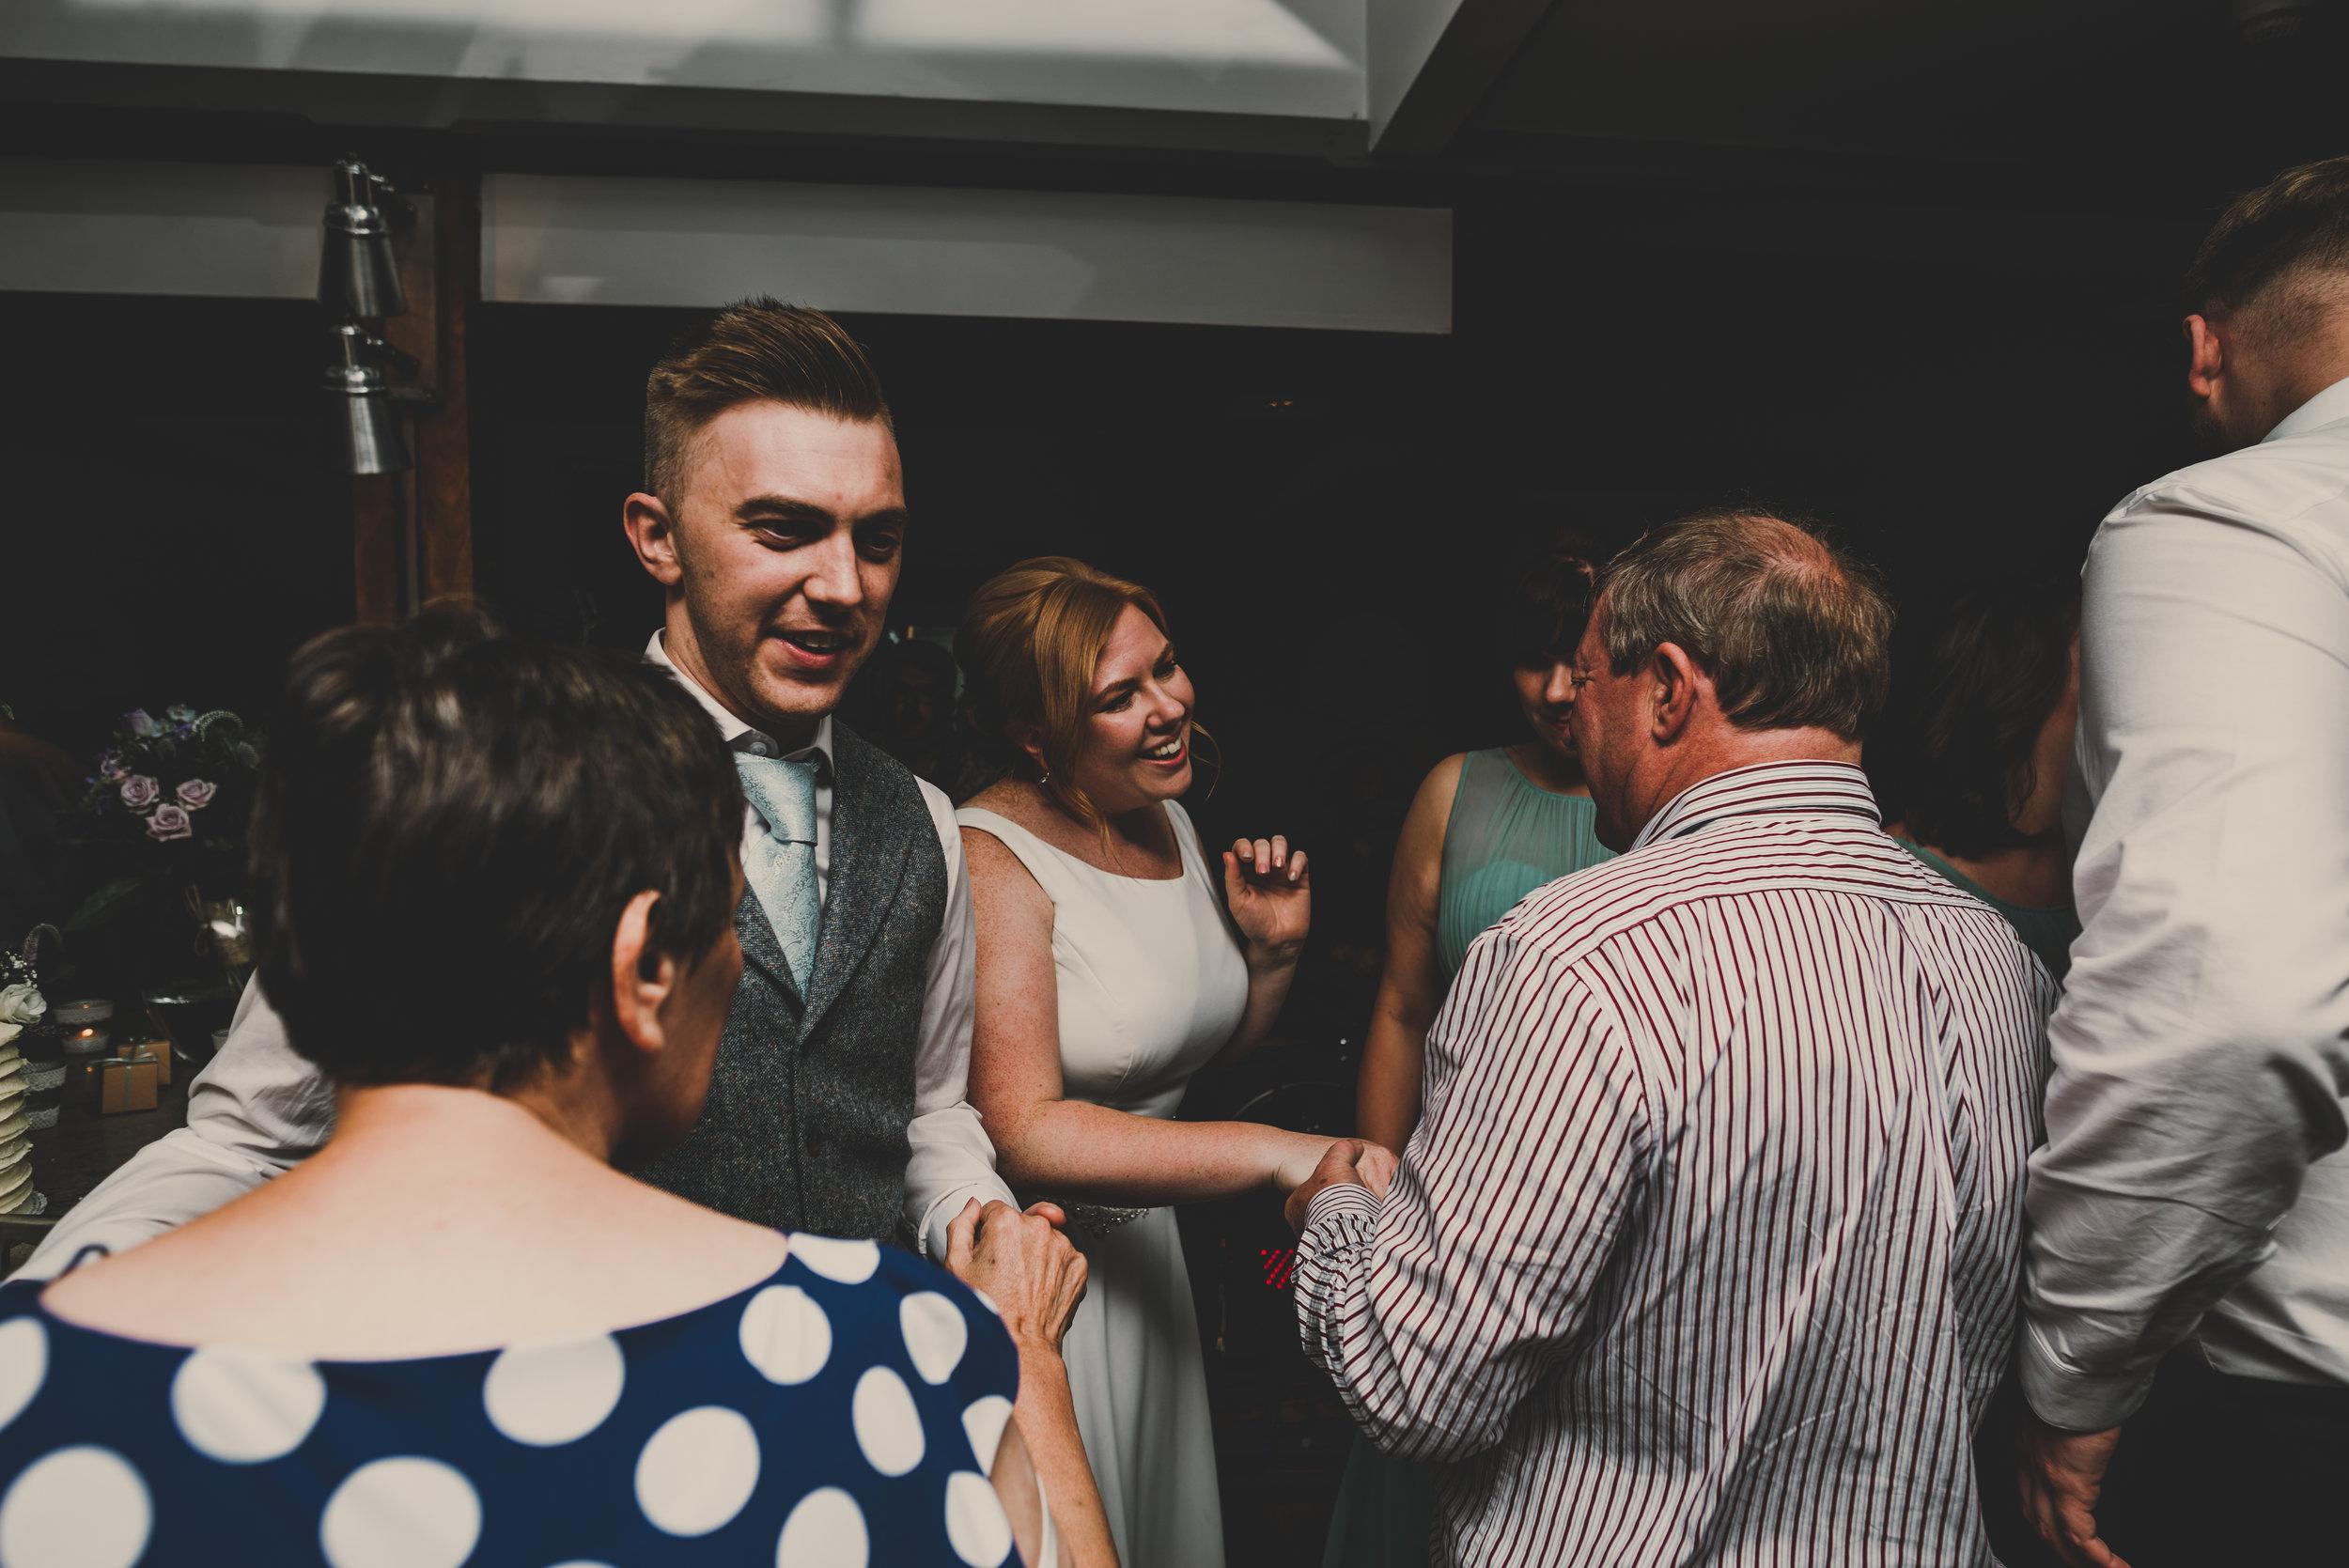 cheshire-alternative-wedding-photography-in-anglesey (22).jpg